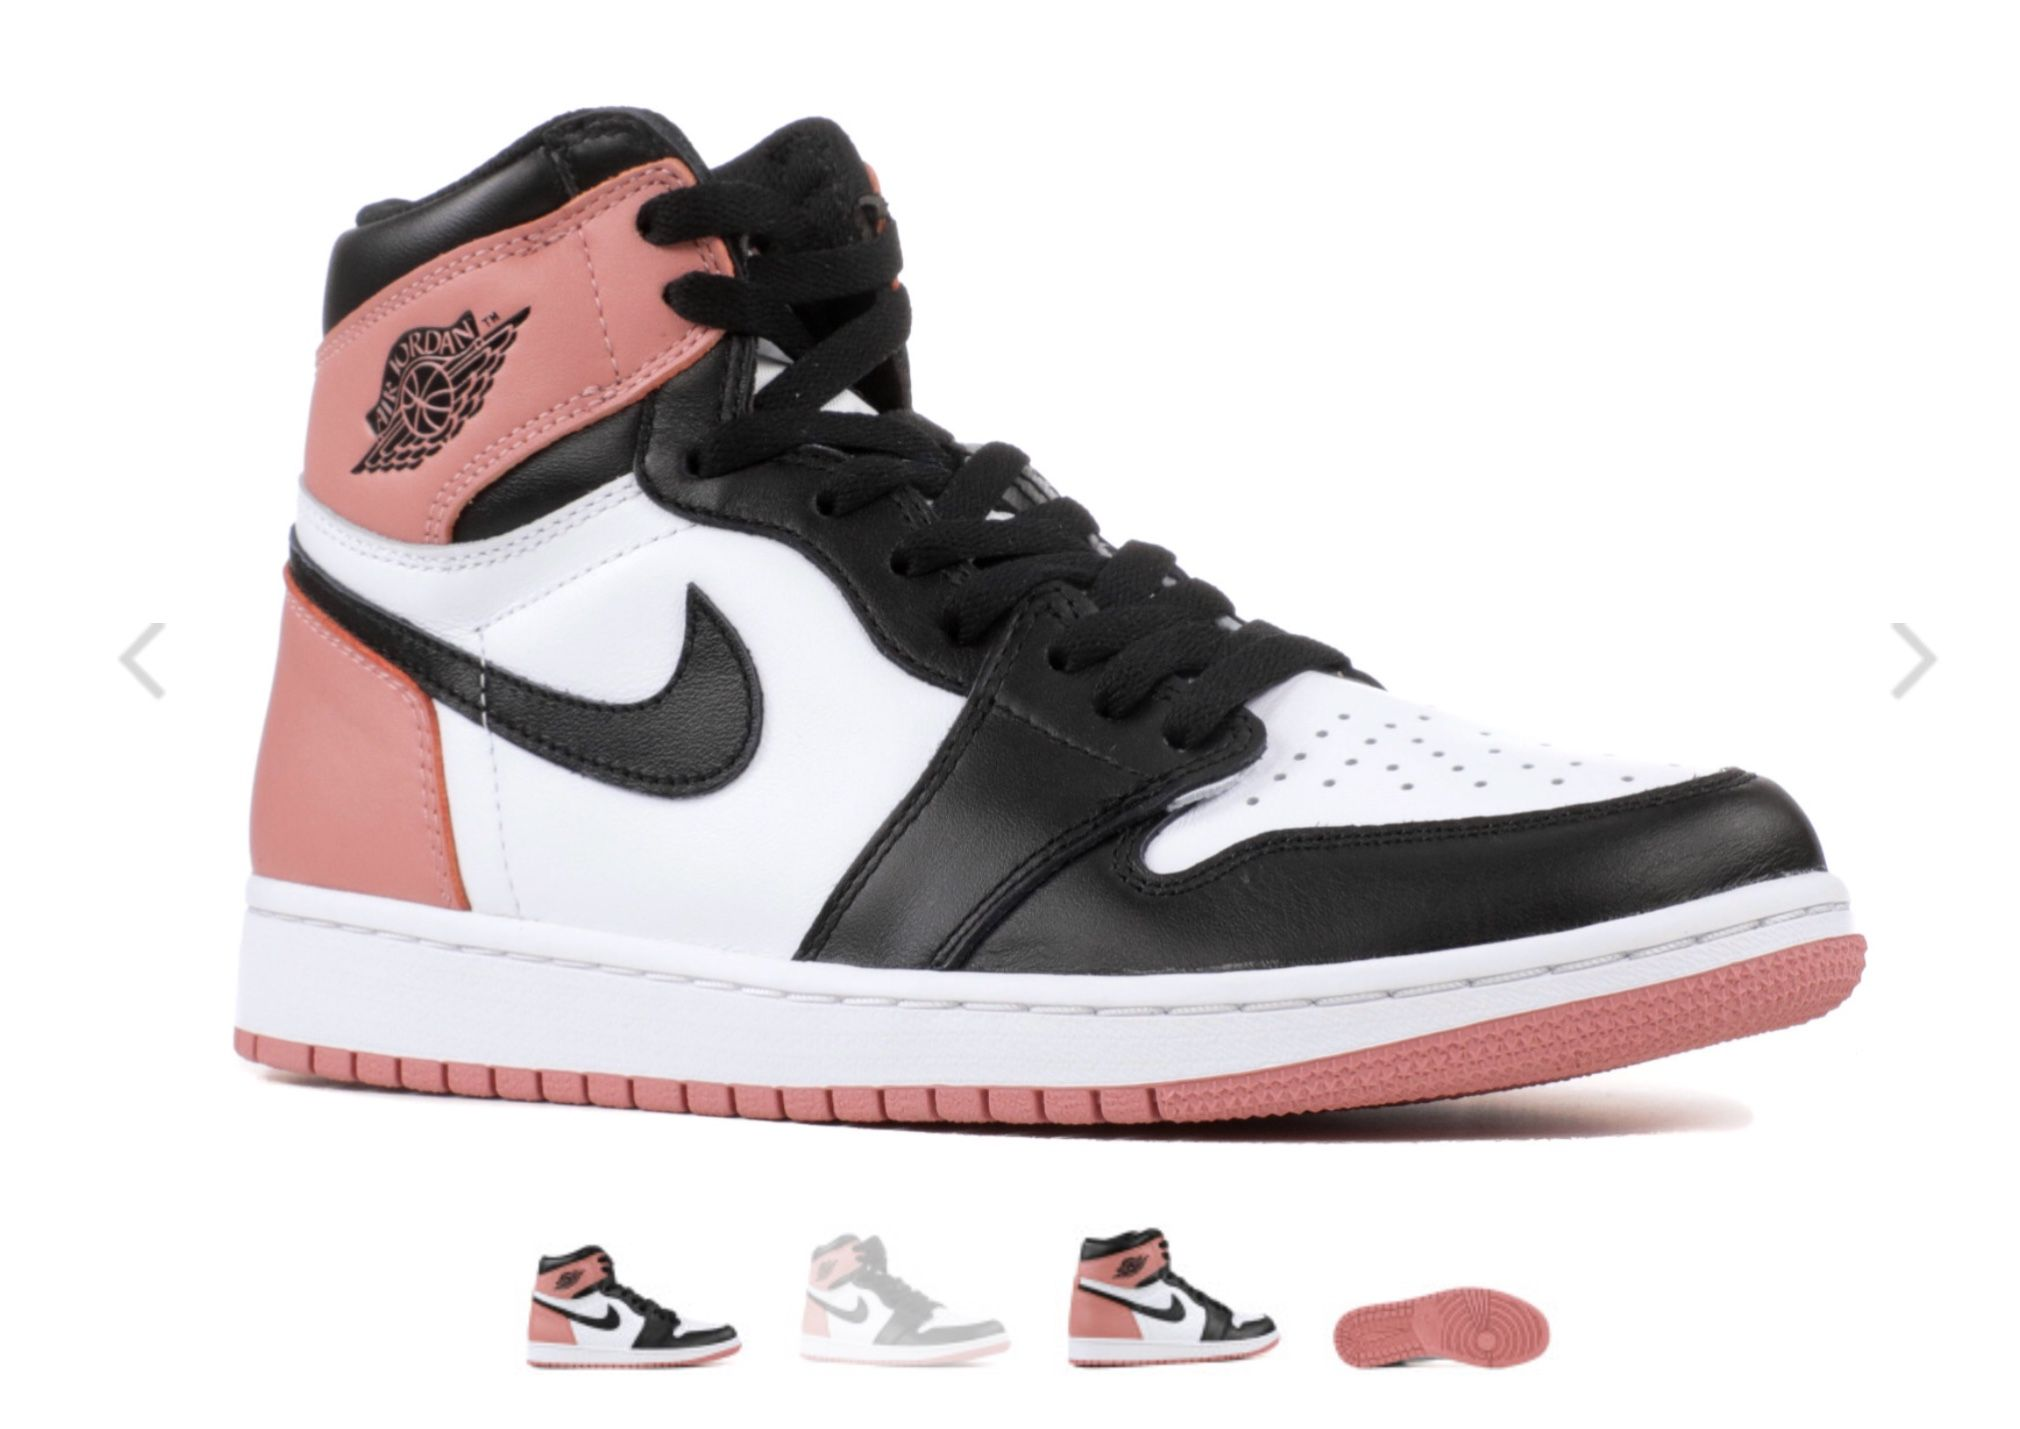 air jordan 1 retro high rosas y negras